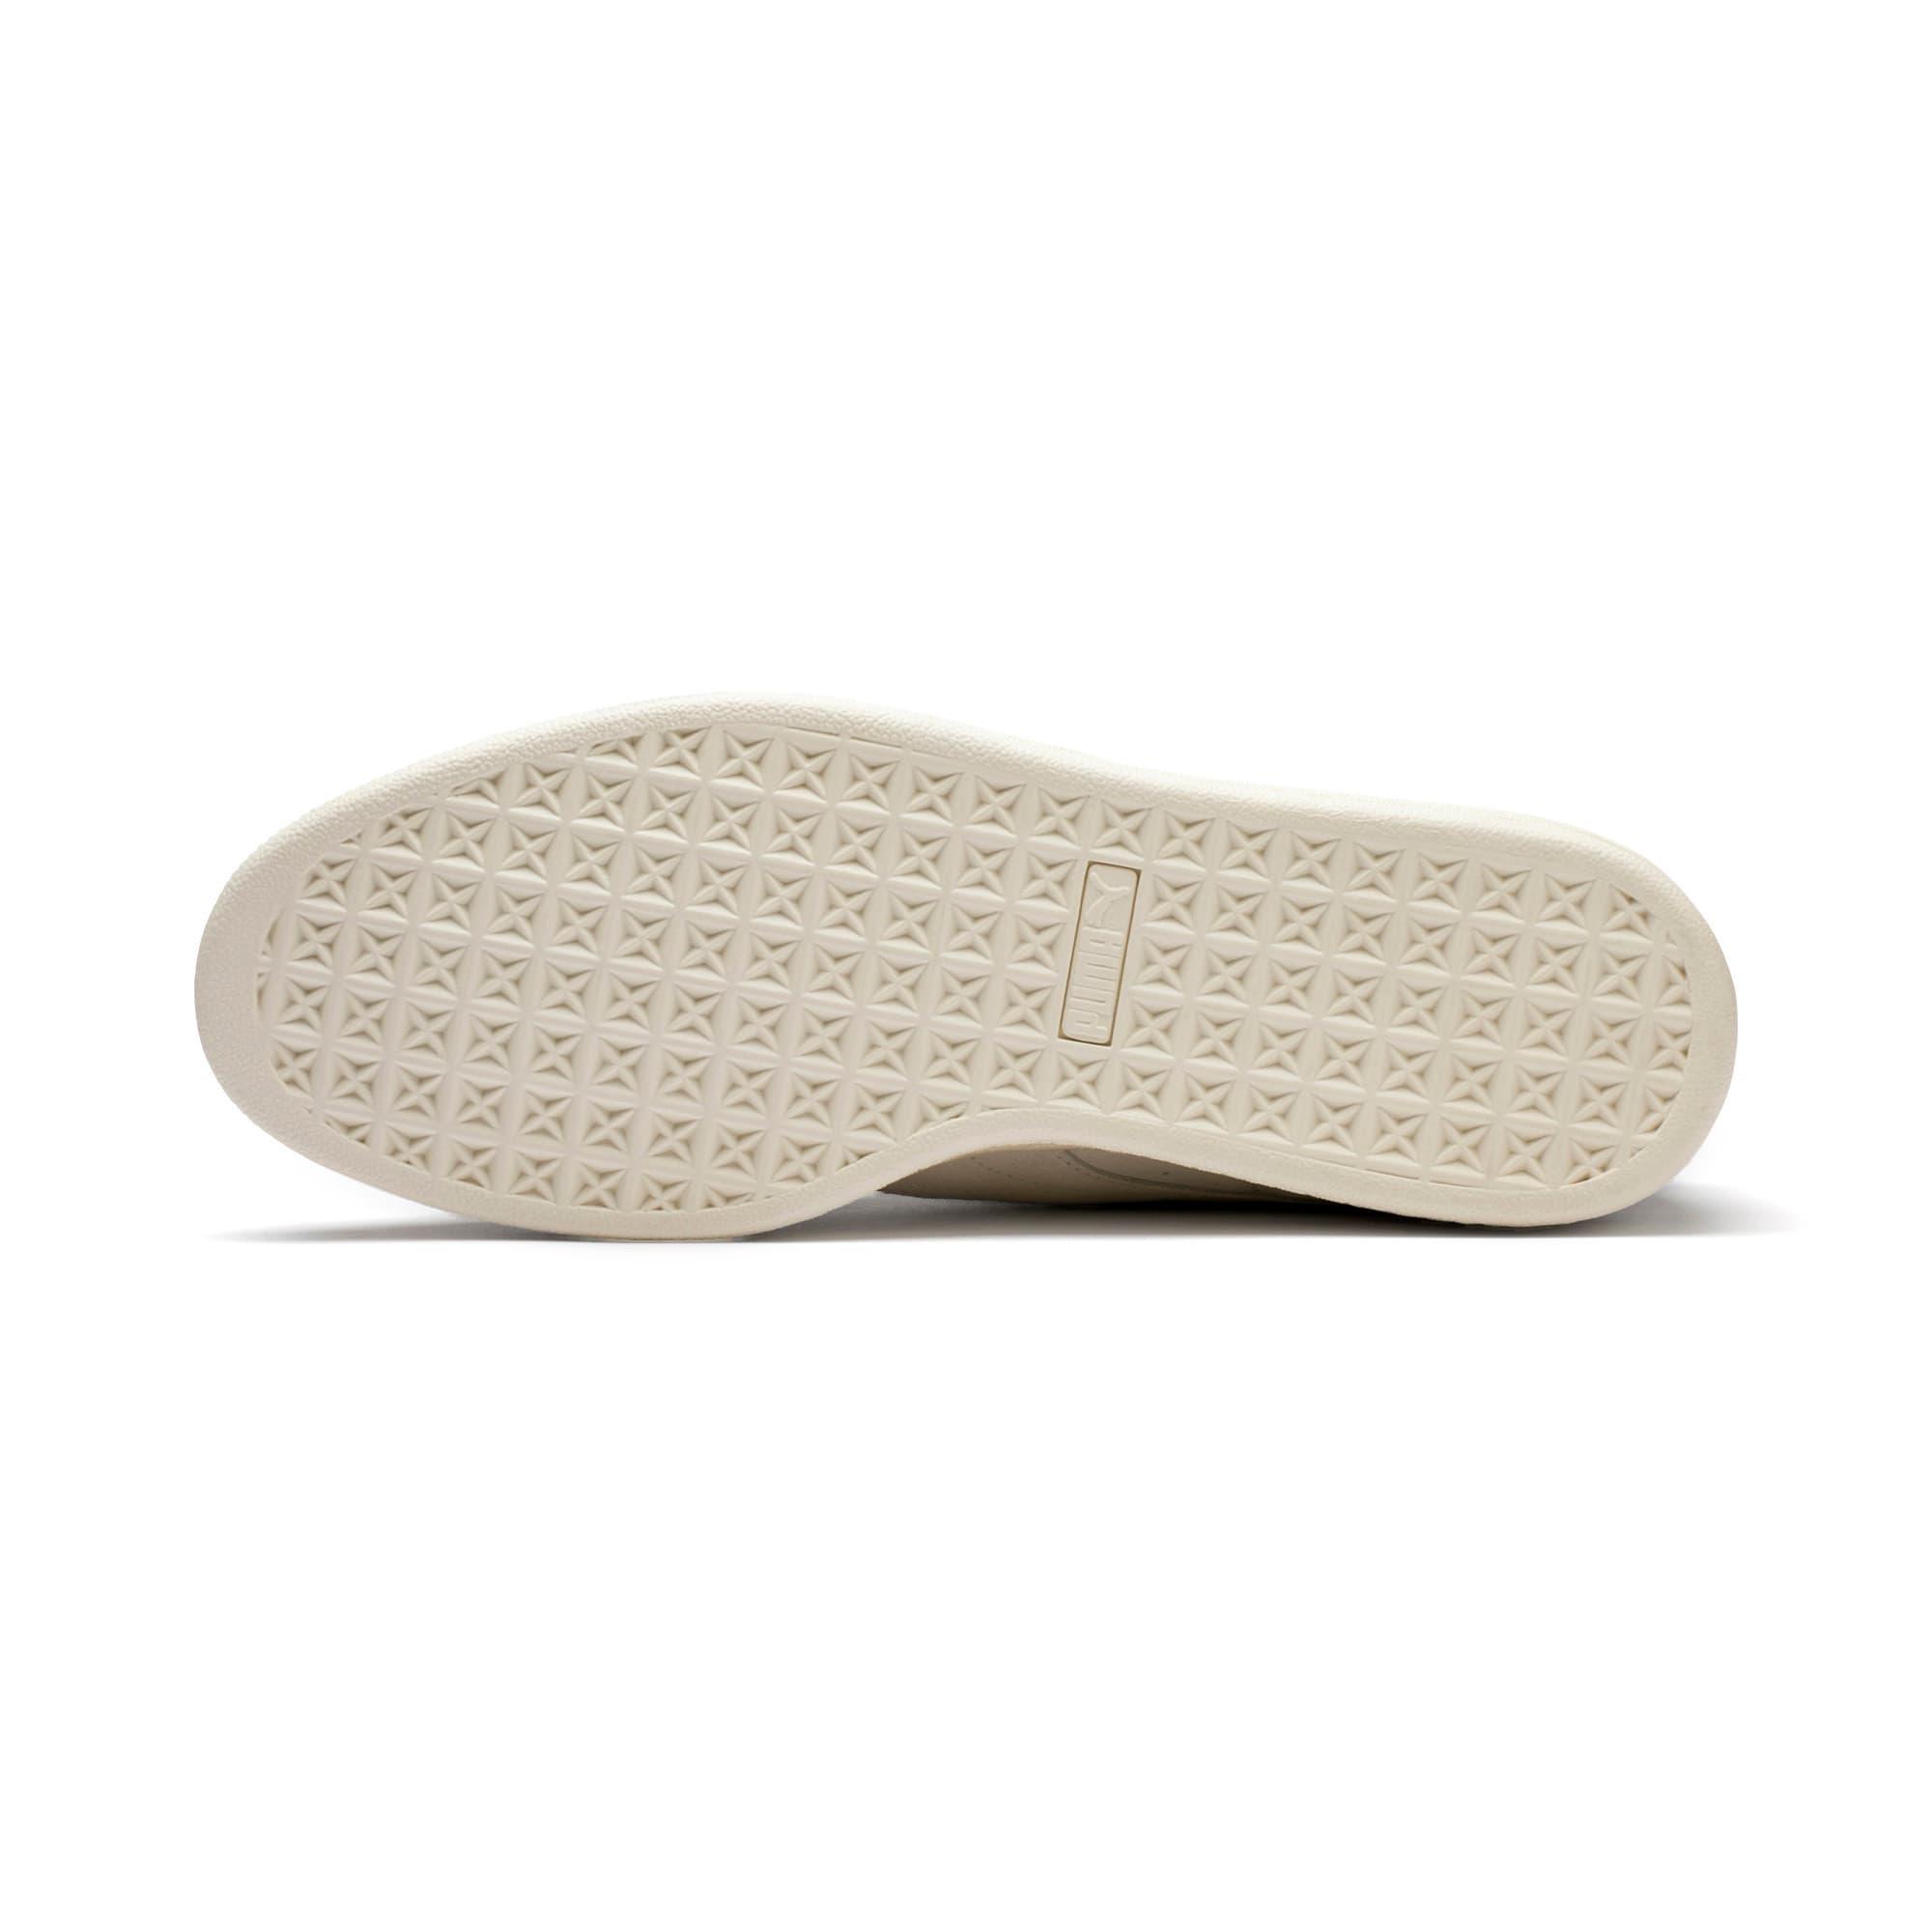 Thumbnail 4 of Suede Classic Easter Sneakers, Whisper White-Whisper White, medium